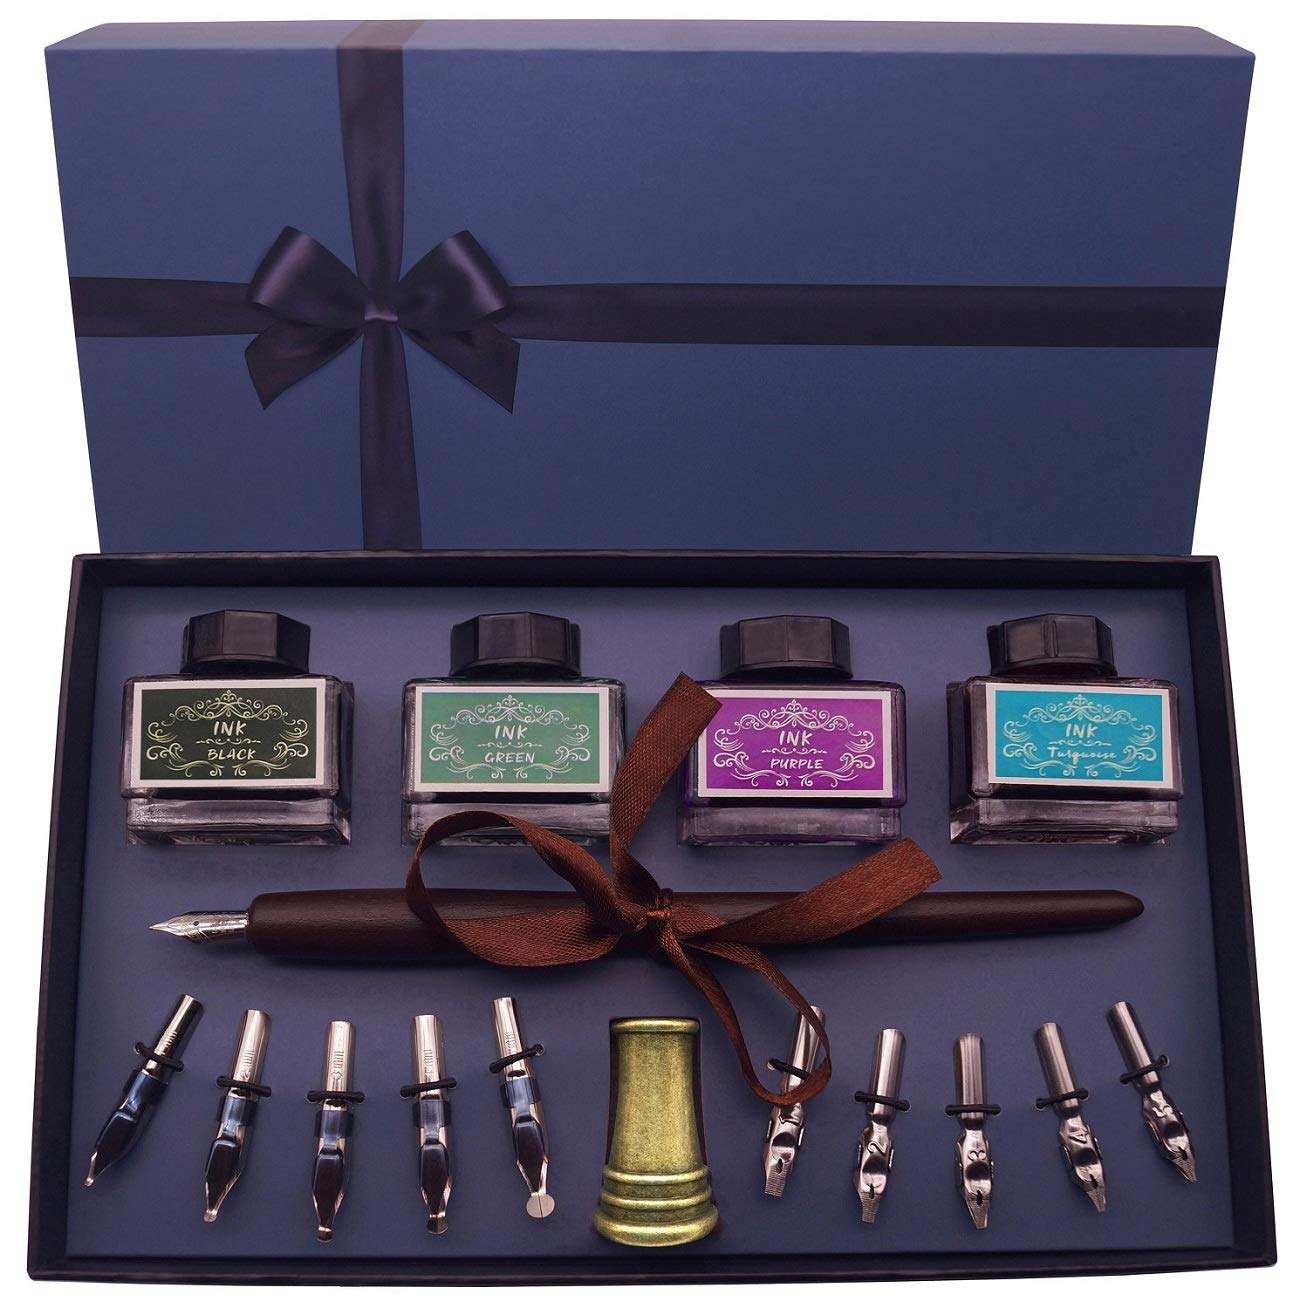 Plotube Calligraphy Pen Set - Includes Wooden Dip Pen, 11 Nibs, 4 Color Ink Bottle, Antique Pen Holder, Instructions by plotube